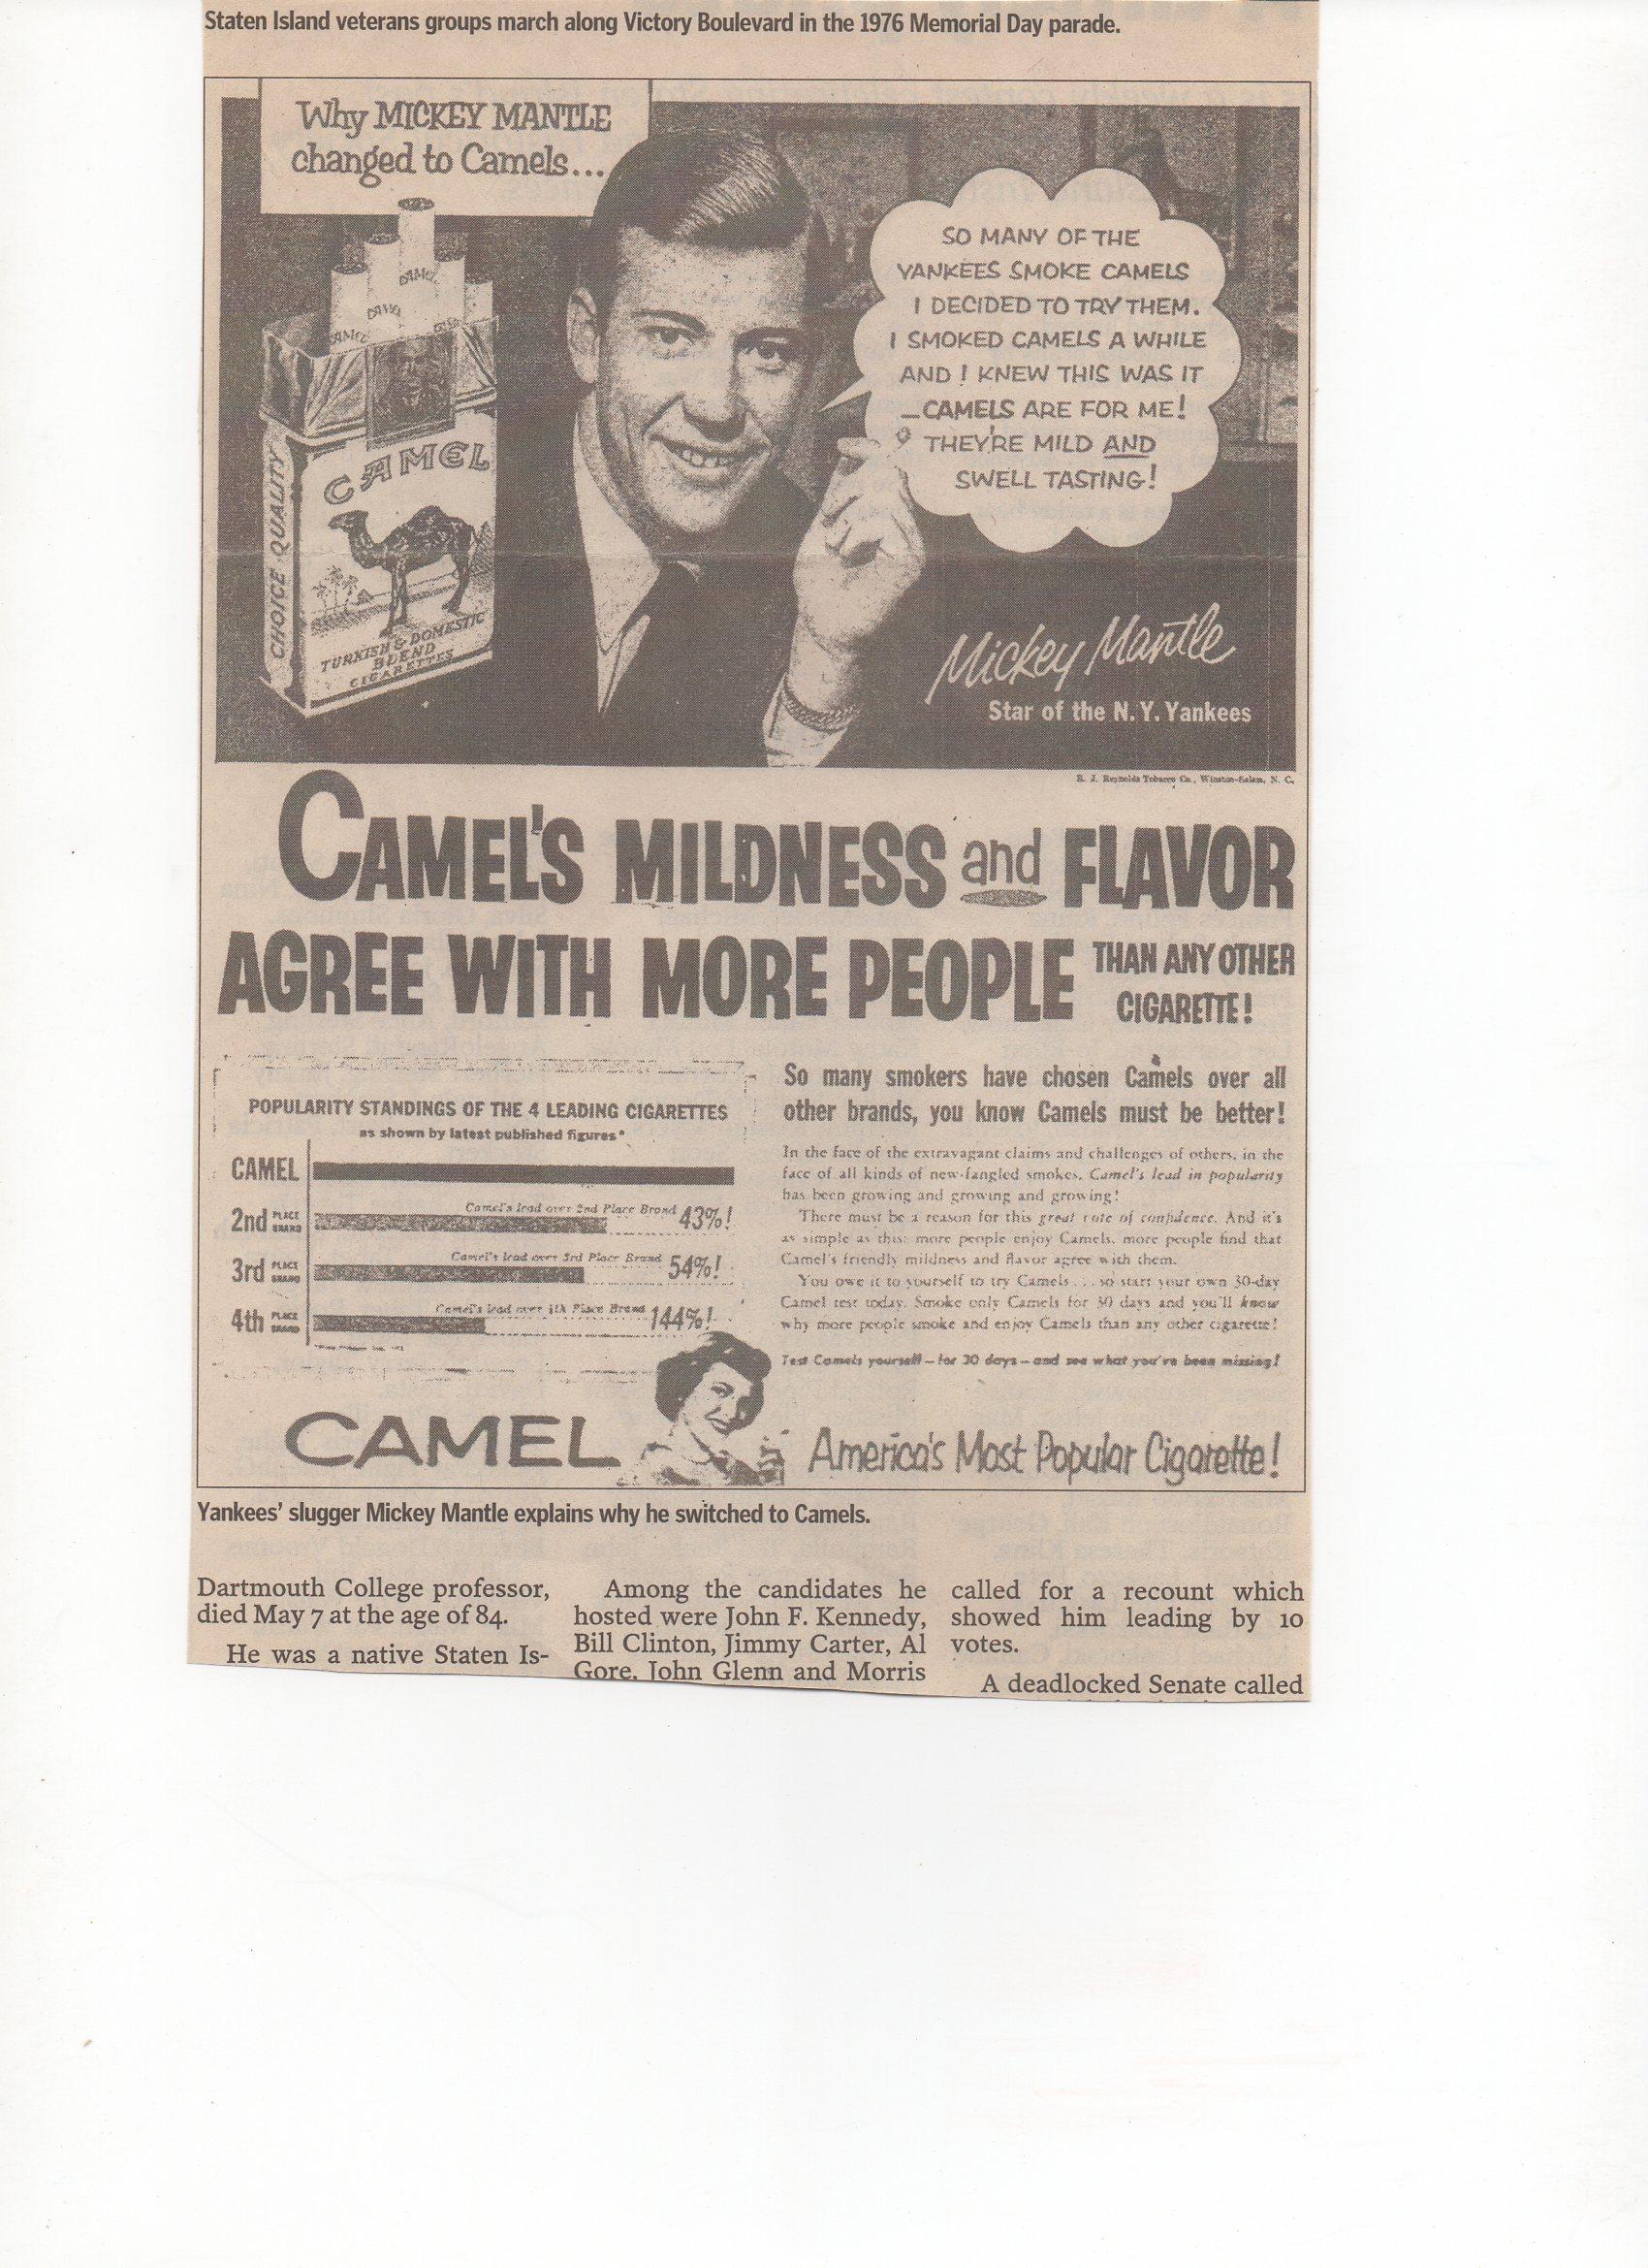 1976 newspaper reprint ad